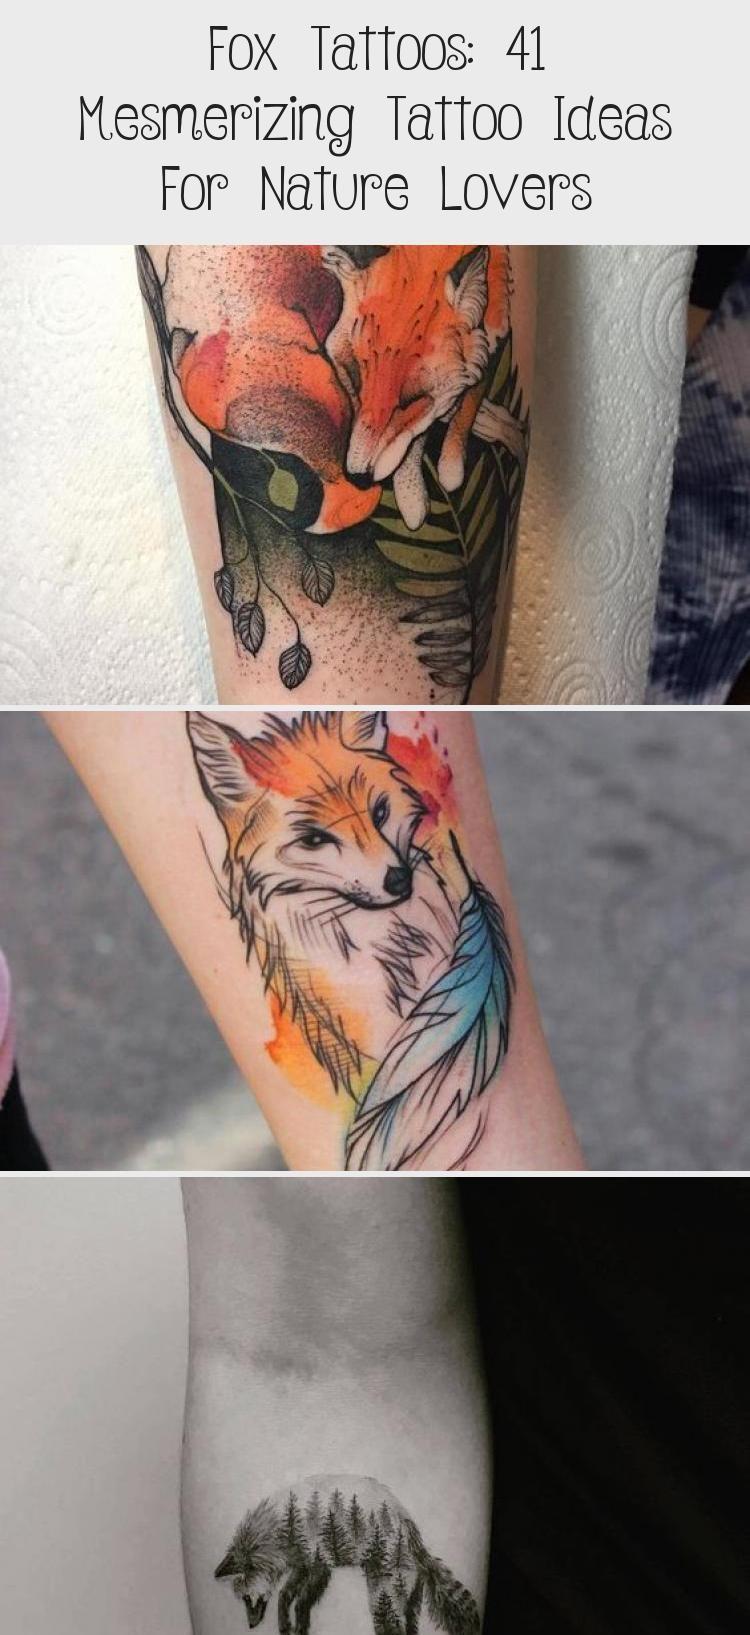 Little Sleeping Fox Tattoo On The Right Shoulder Blade Tattooideendatum Tattooideenoberschenkel Tattooideenb In 2020 Nature Lover Tattoo Fox Tattoo Small Fox Tattoo